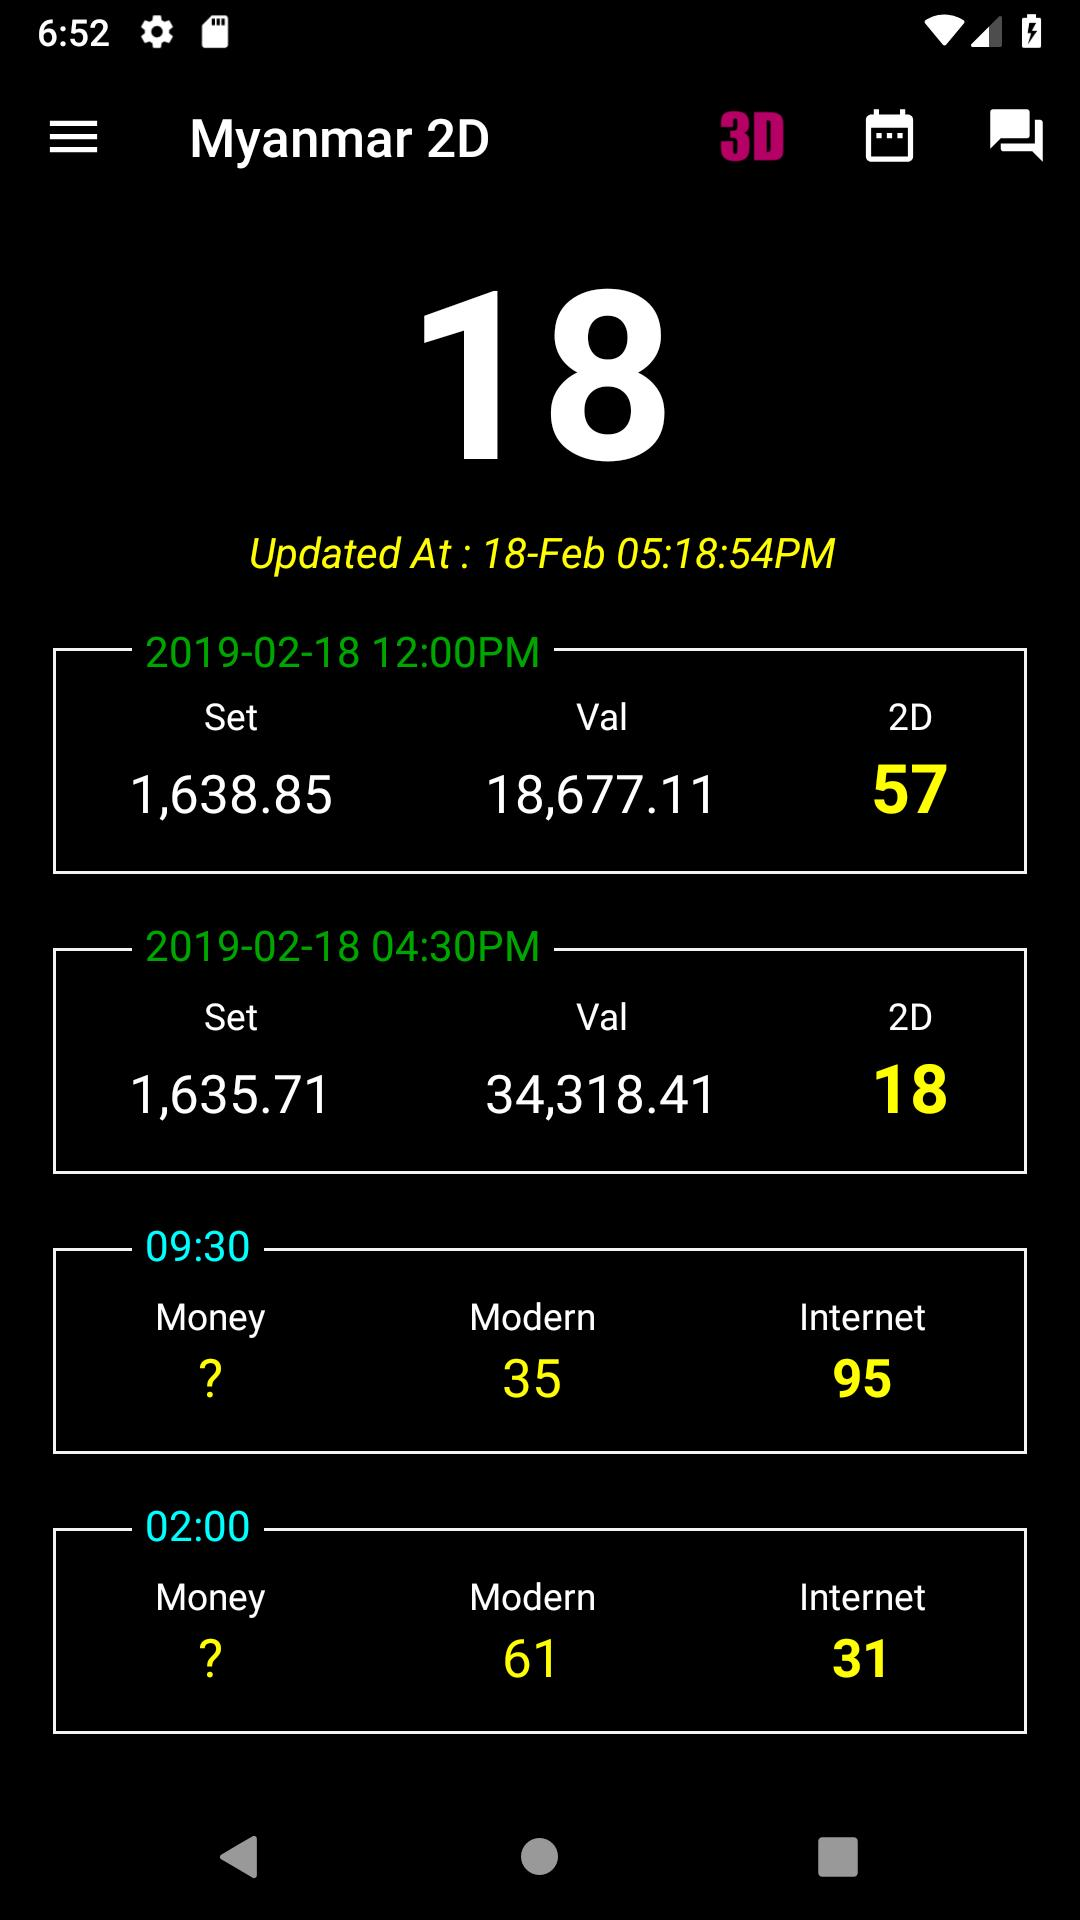 Myanmar 2D/3D Live Update - MMDroidUser 1.3.02 Screenshot 1